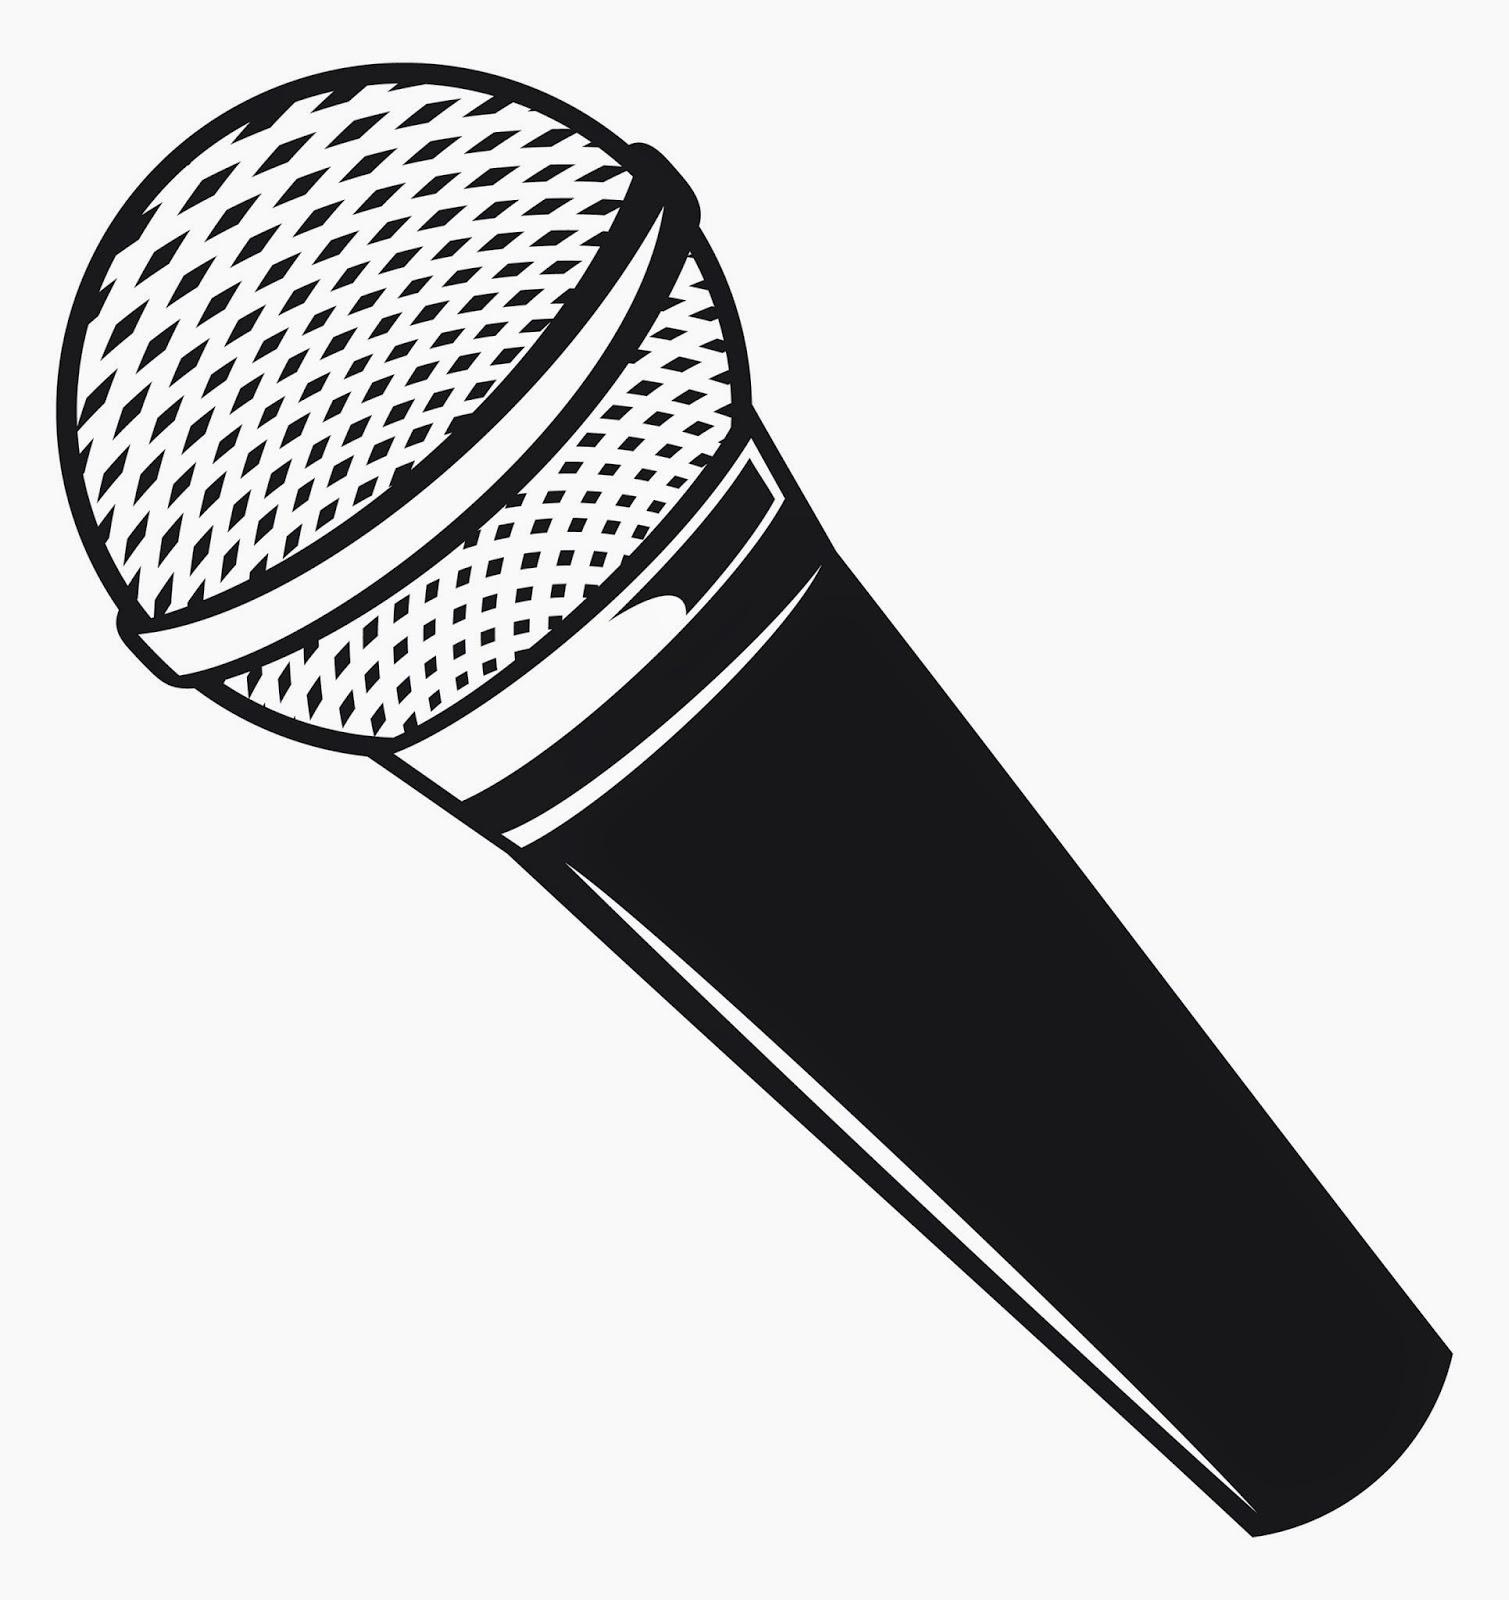 Microphone Drawing At Getdrawings